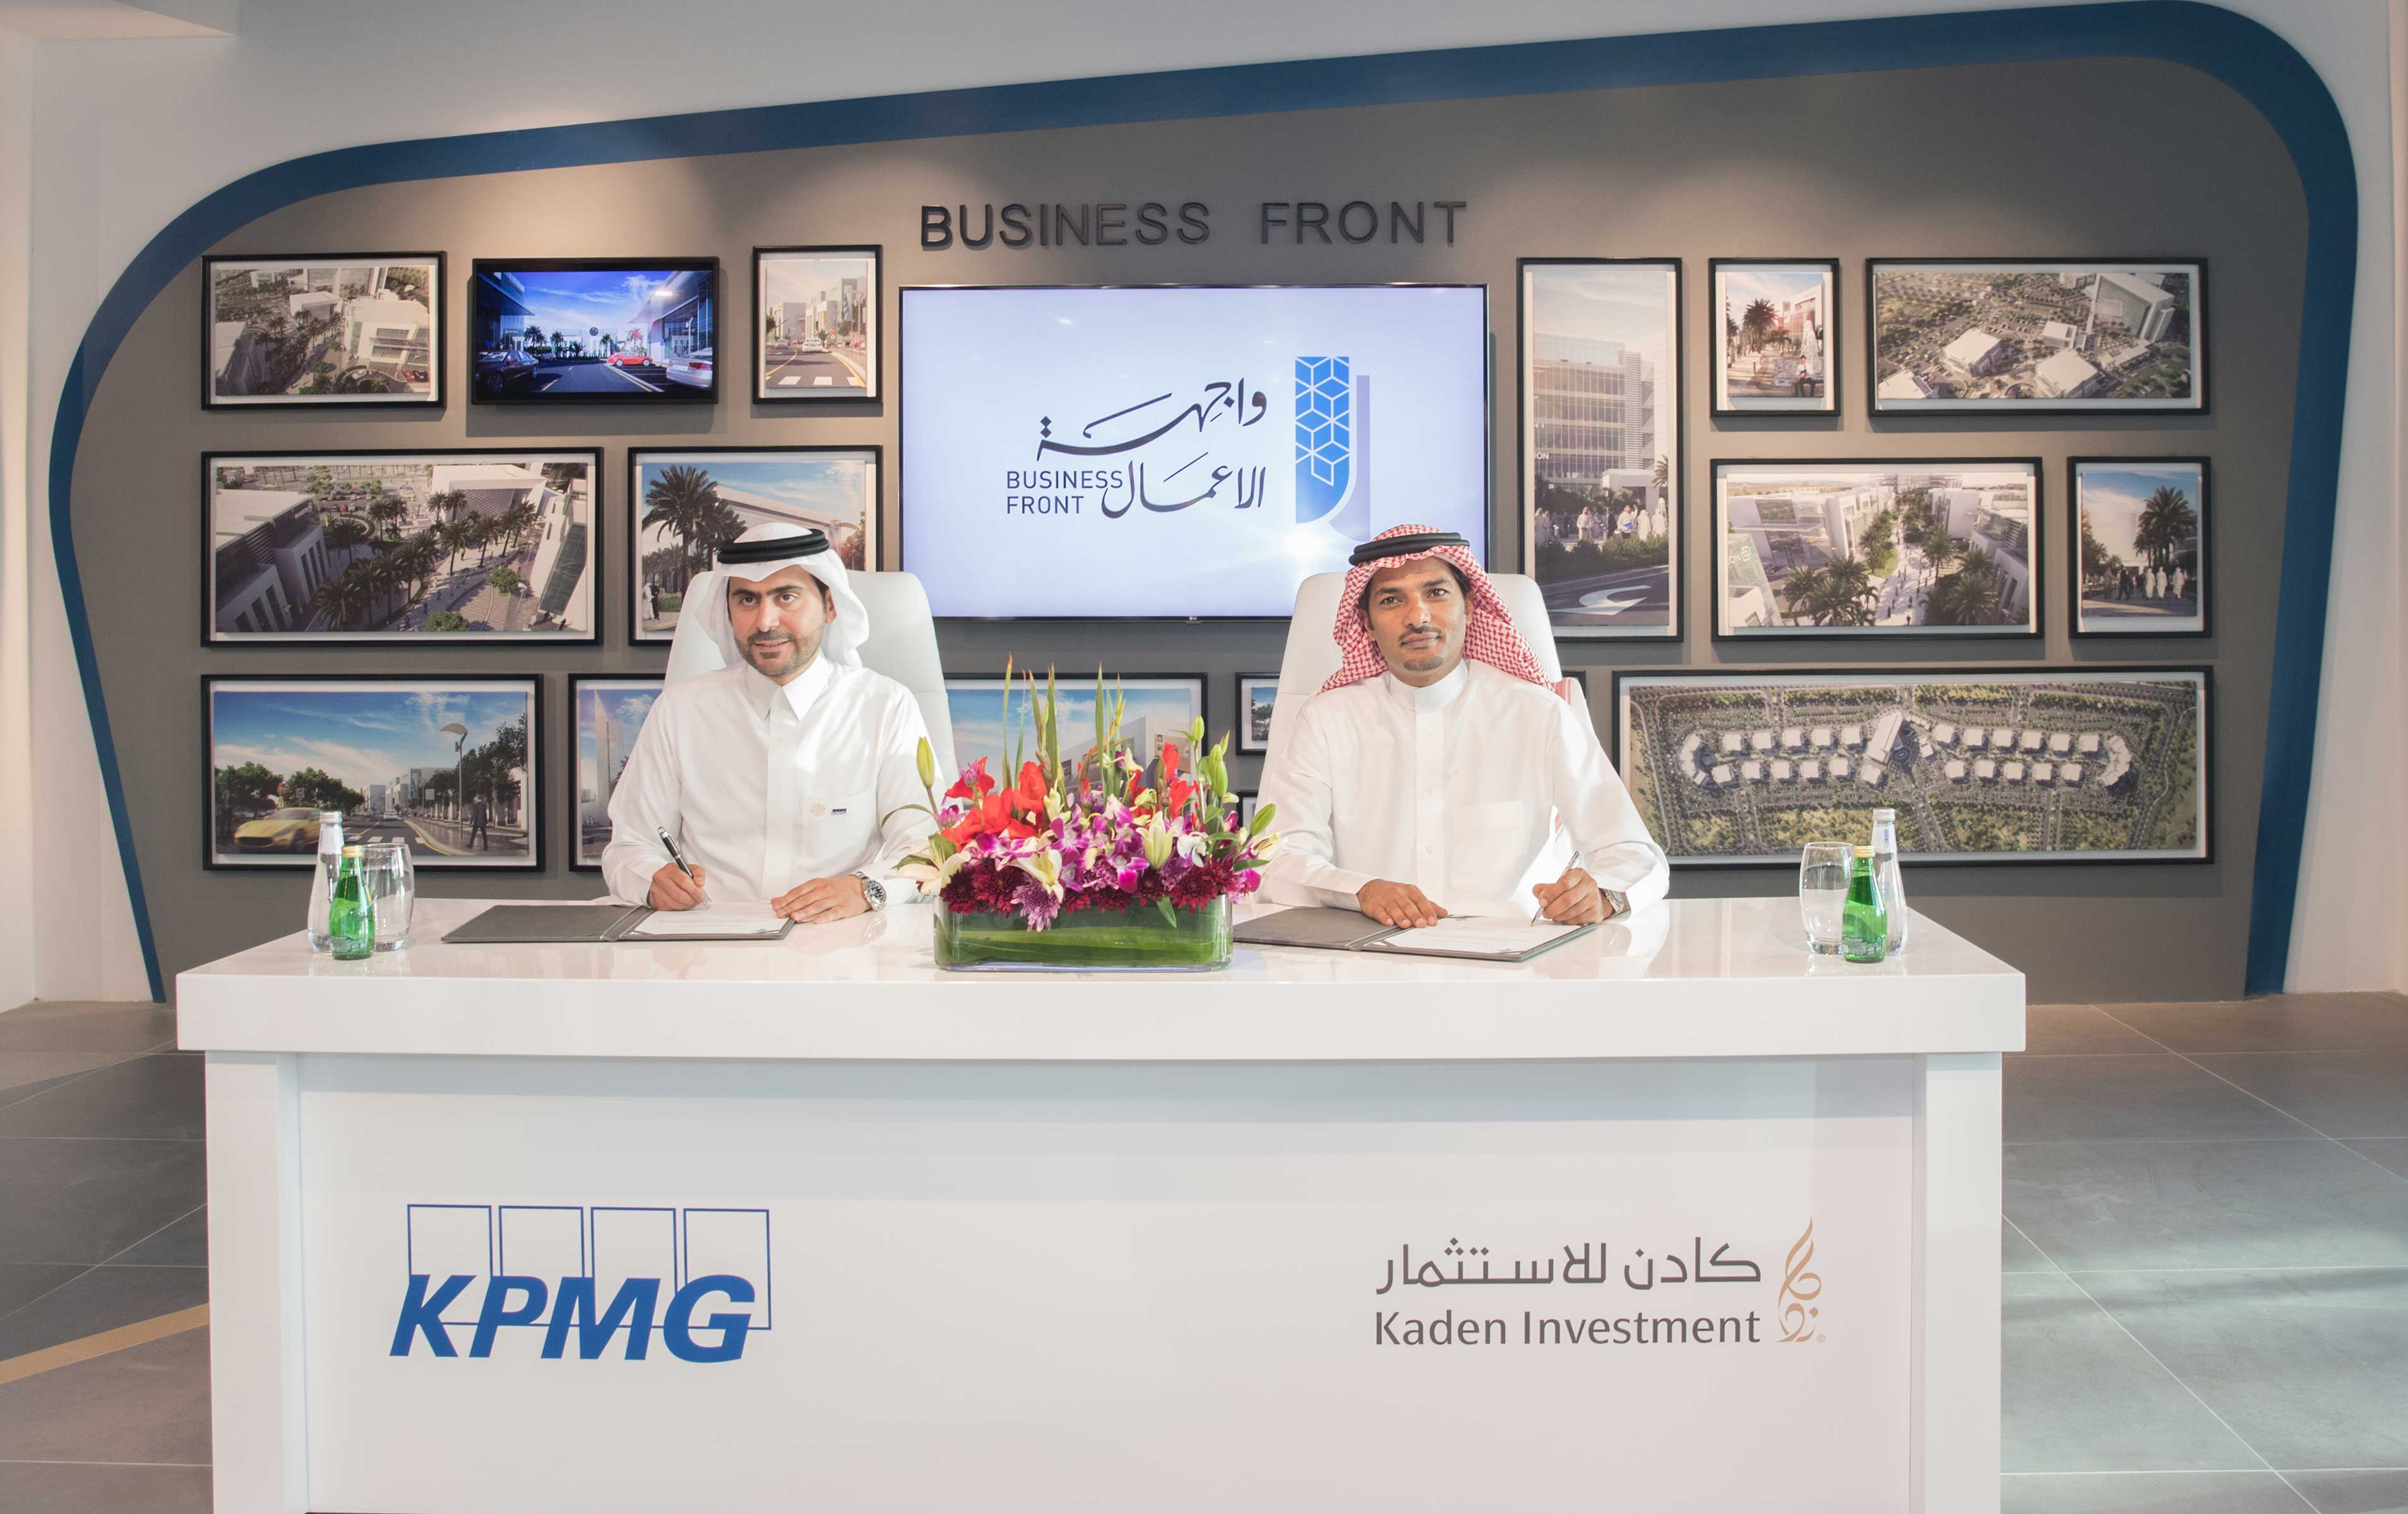 KPMG_New-Office-Image